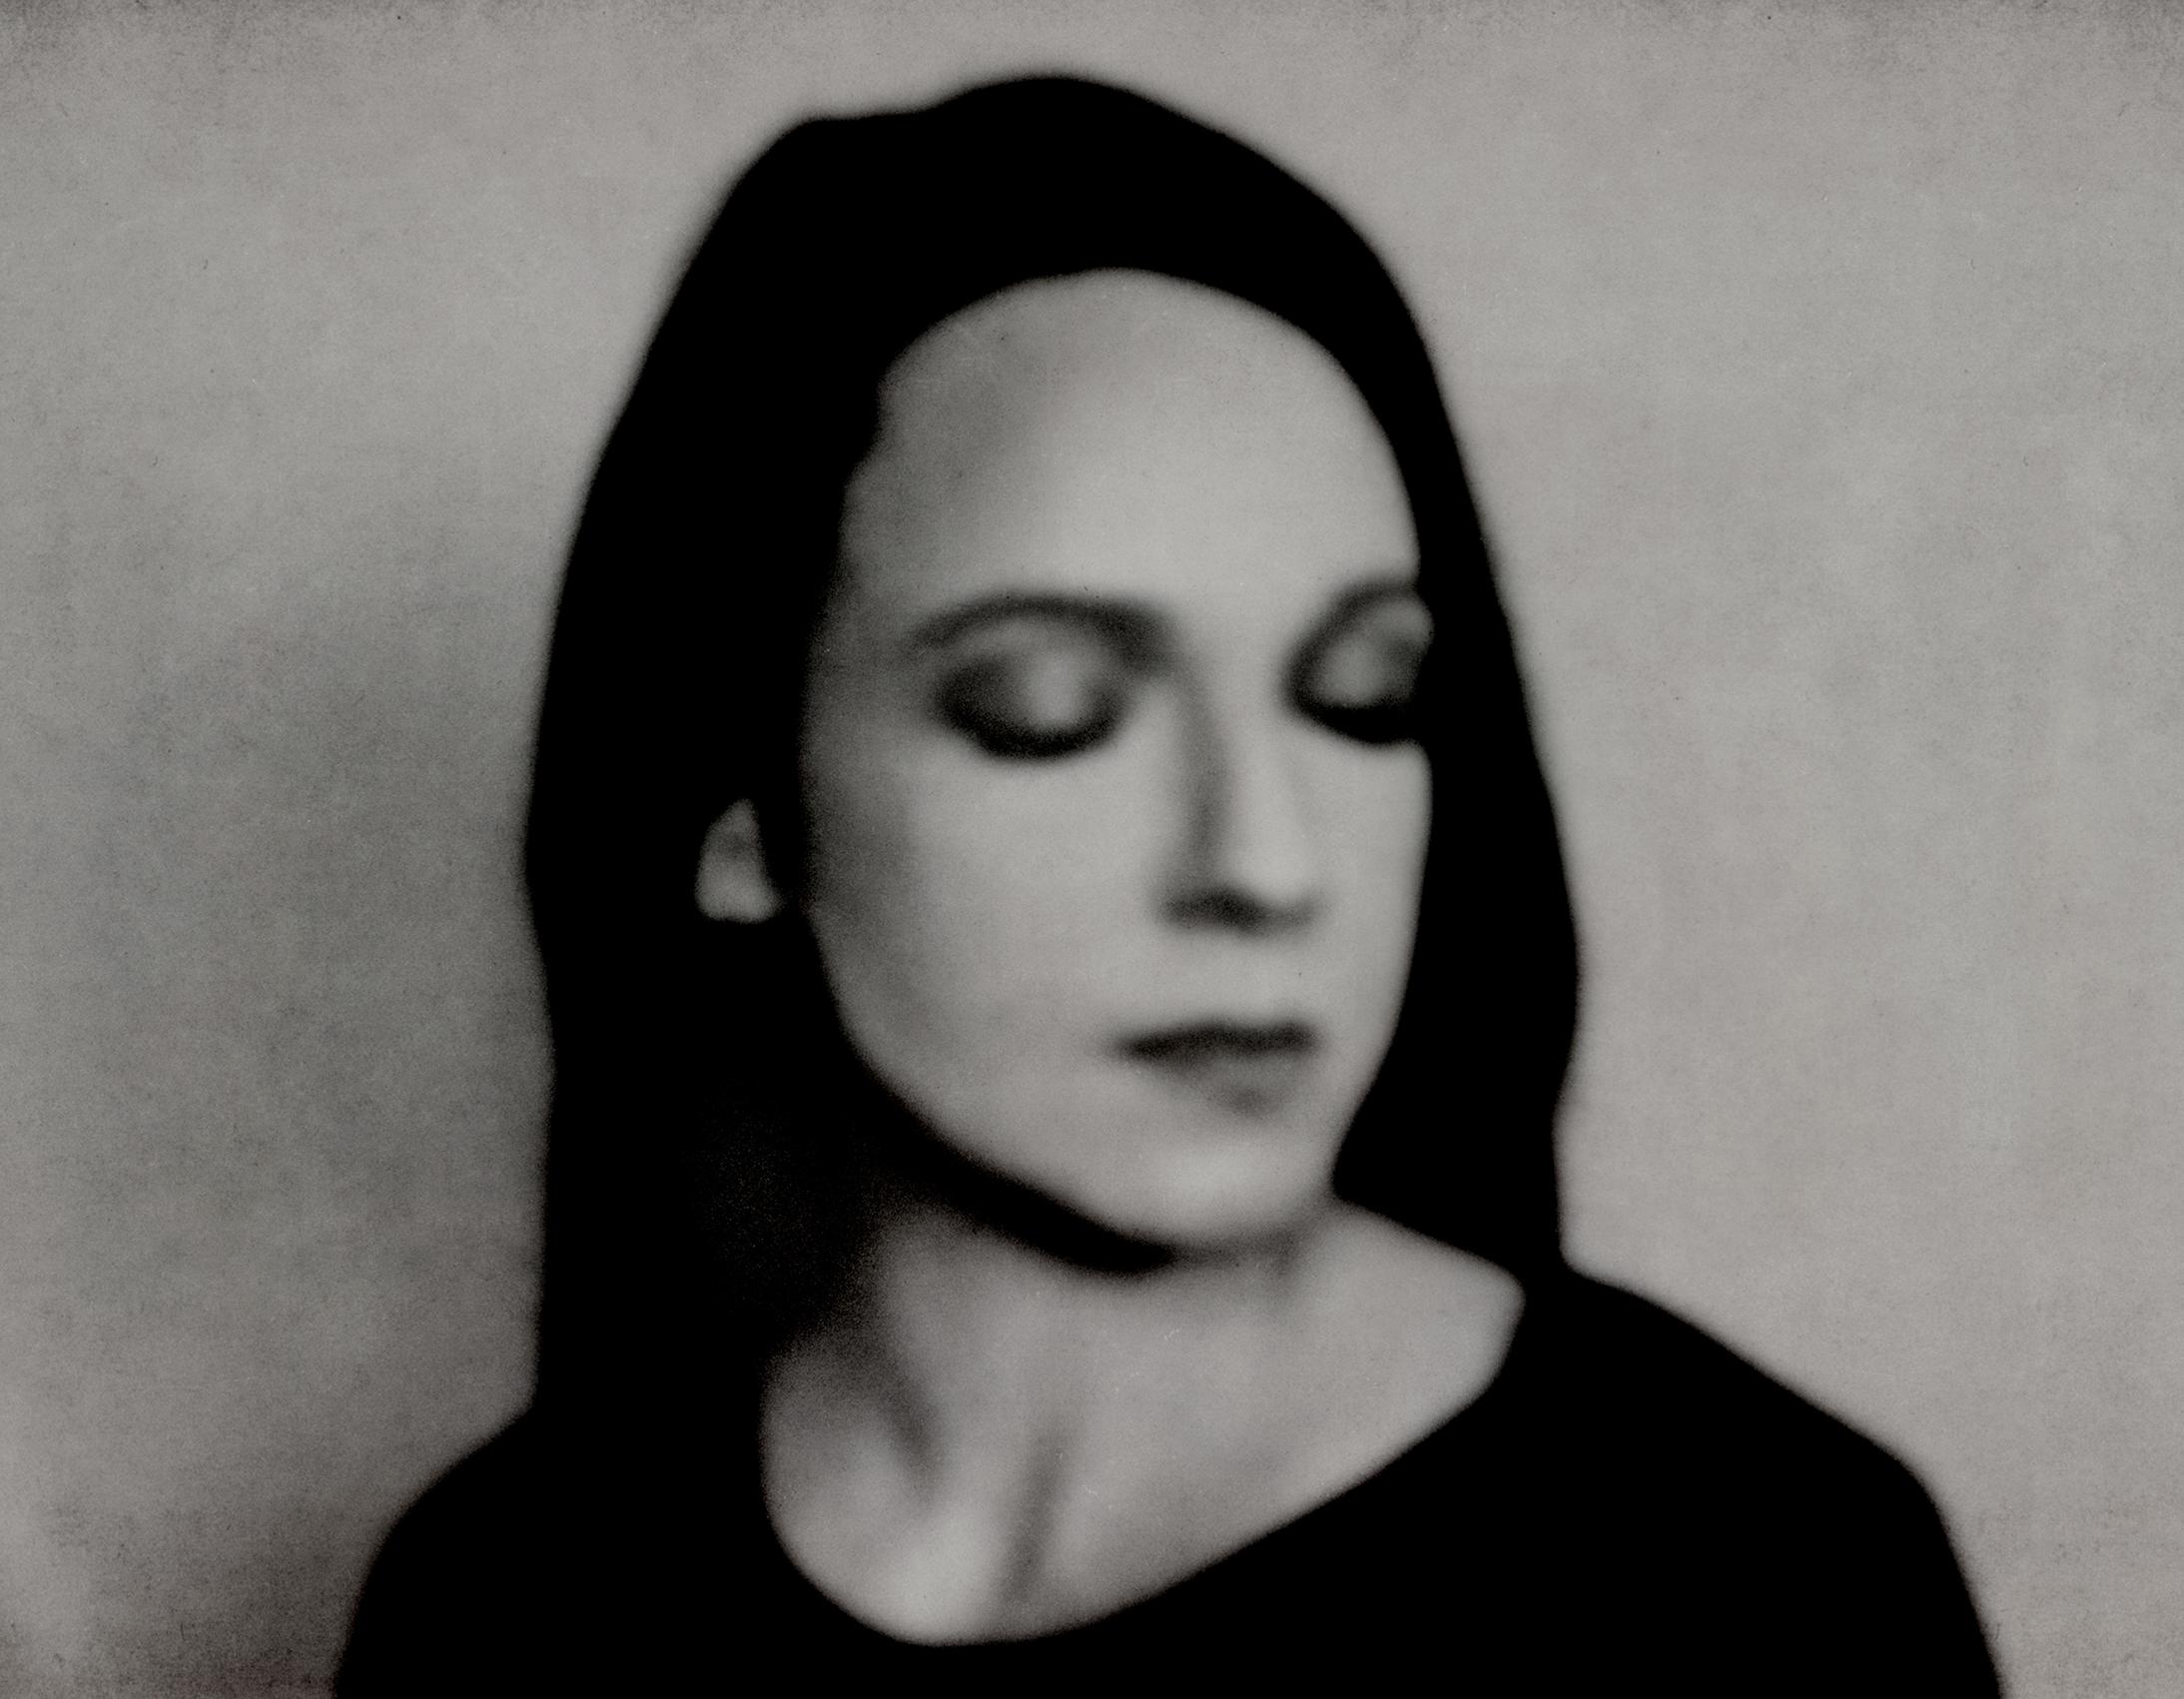 Caroline Kebekus